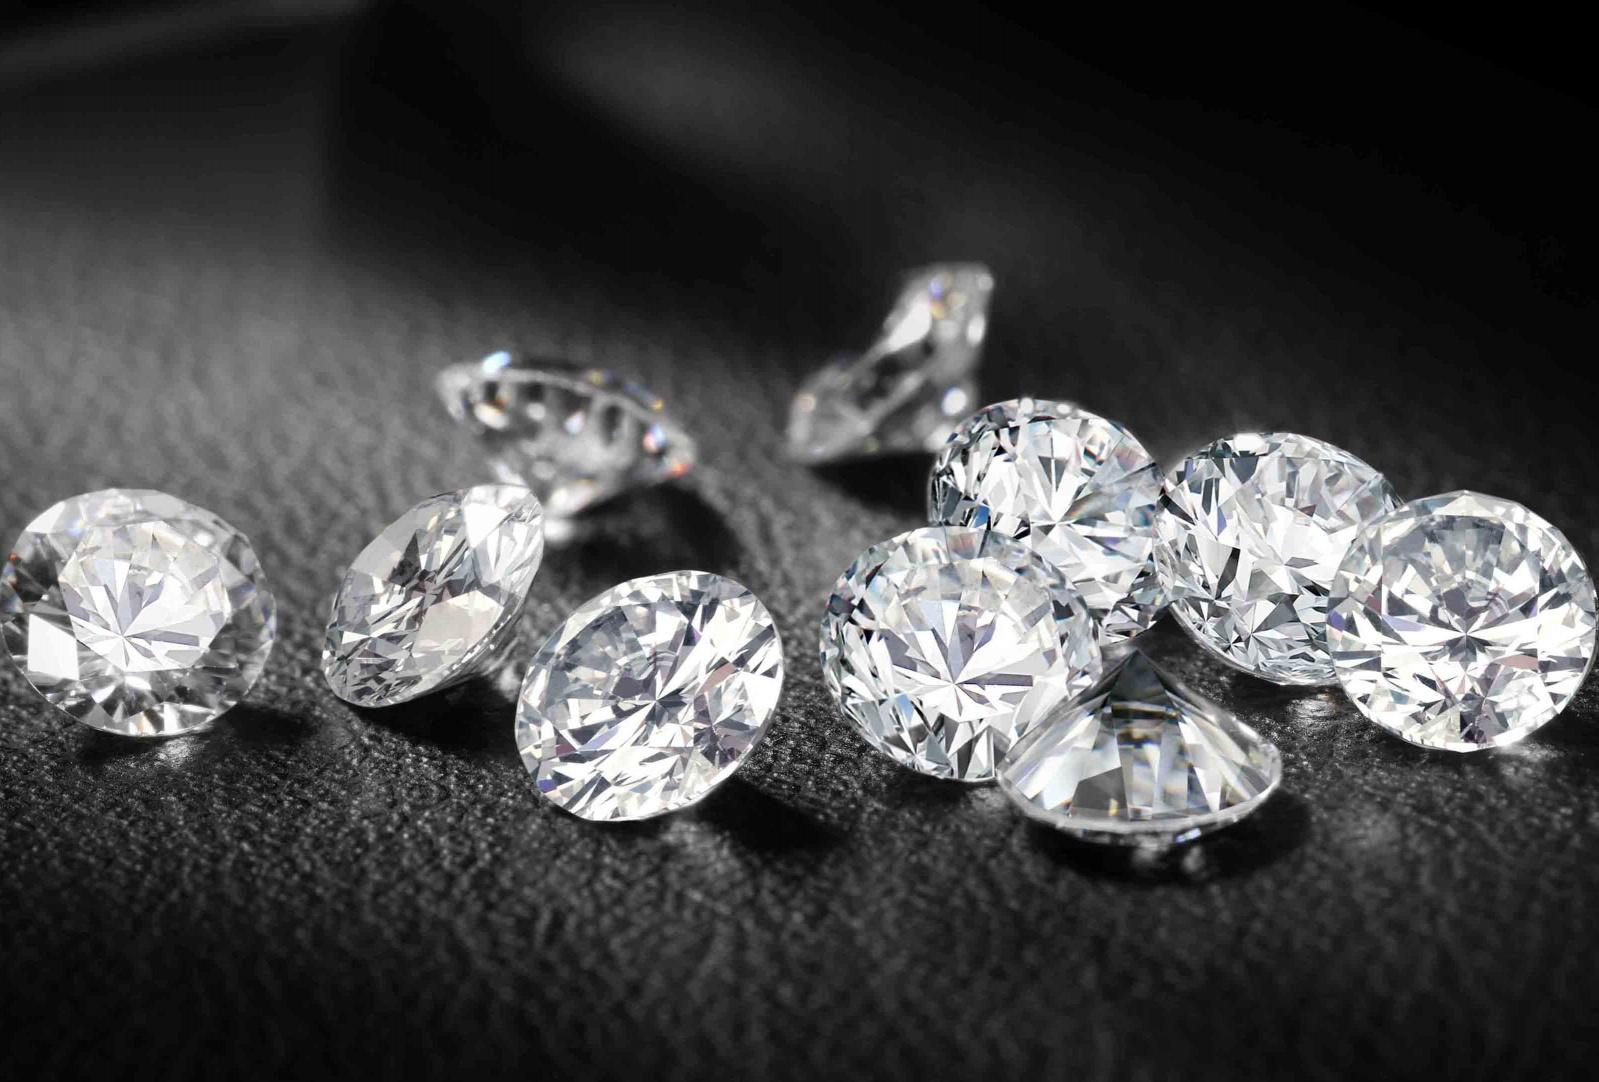 diamanti clima surriscaldamento globale